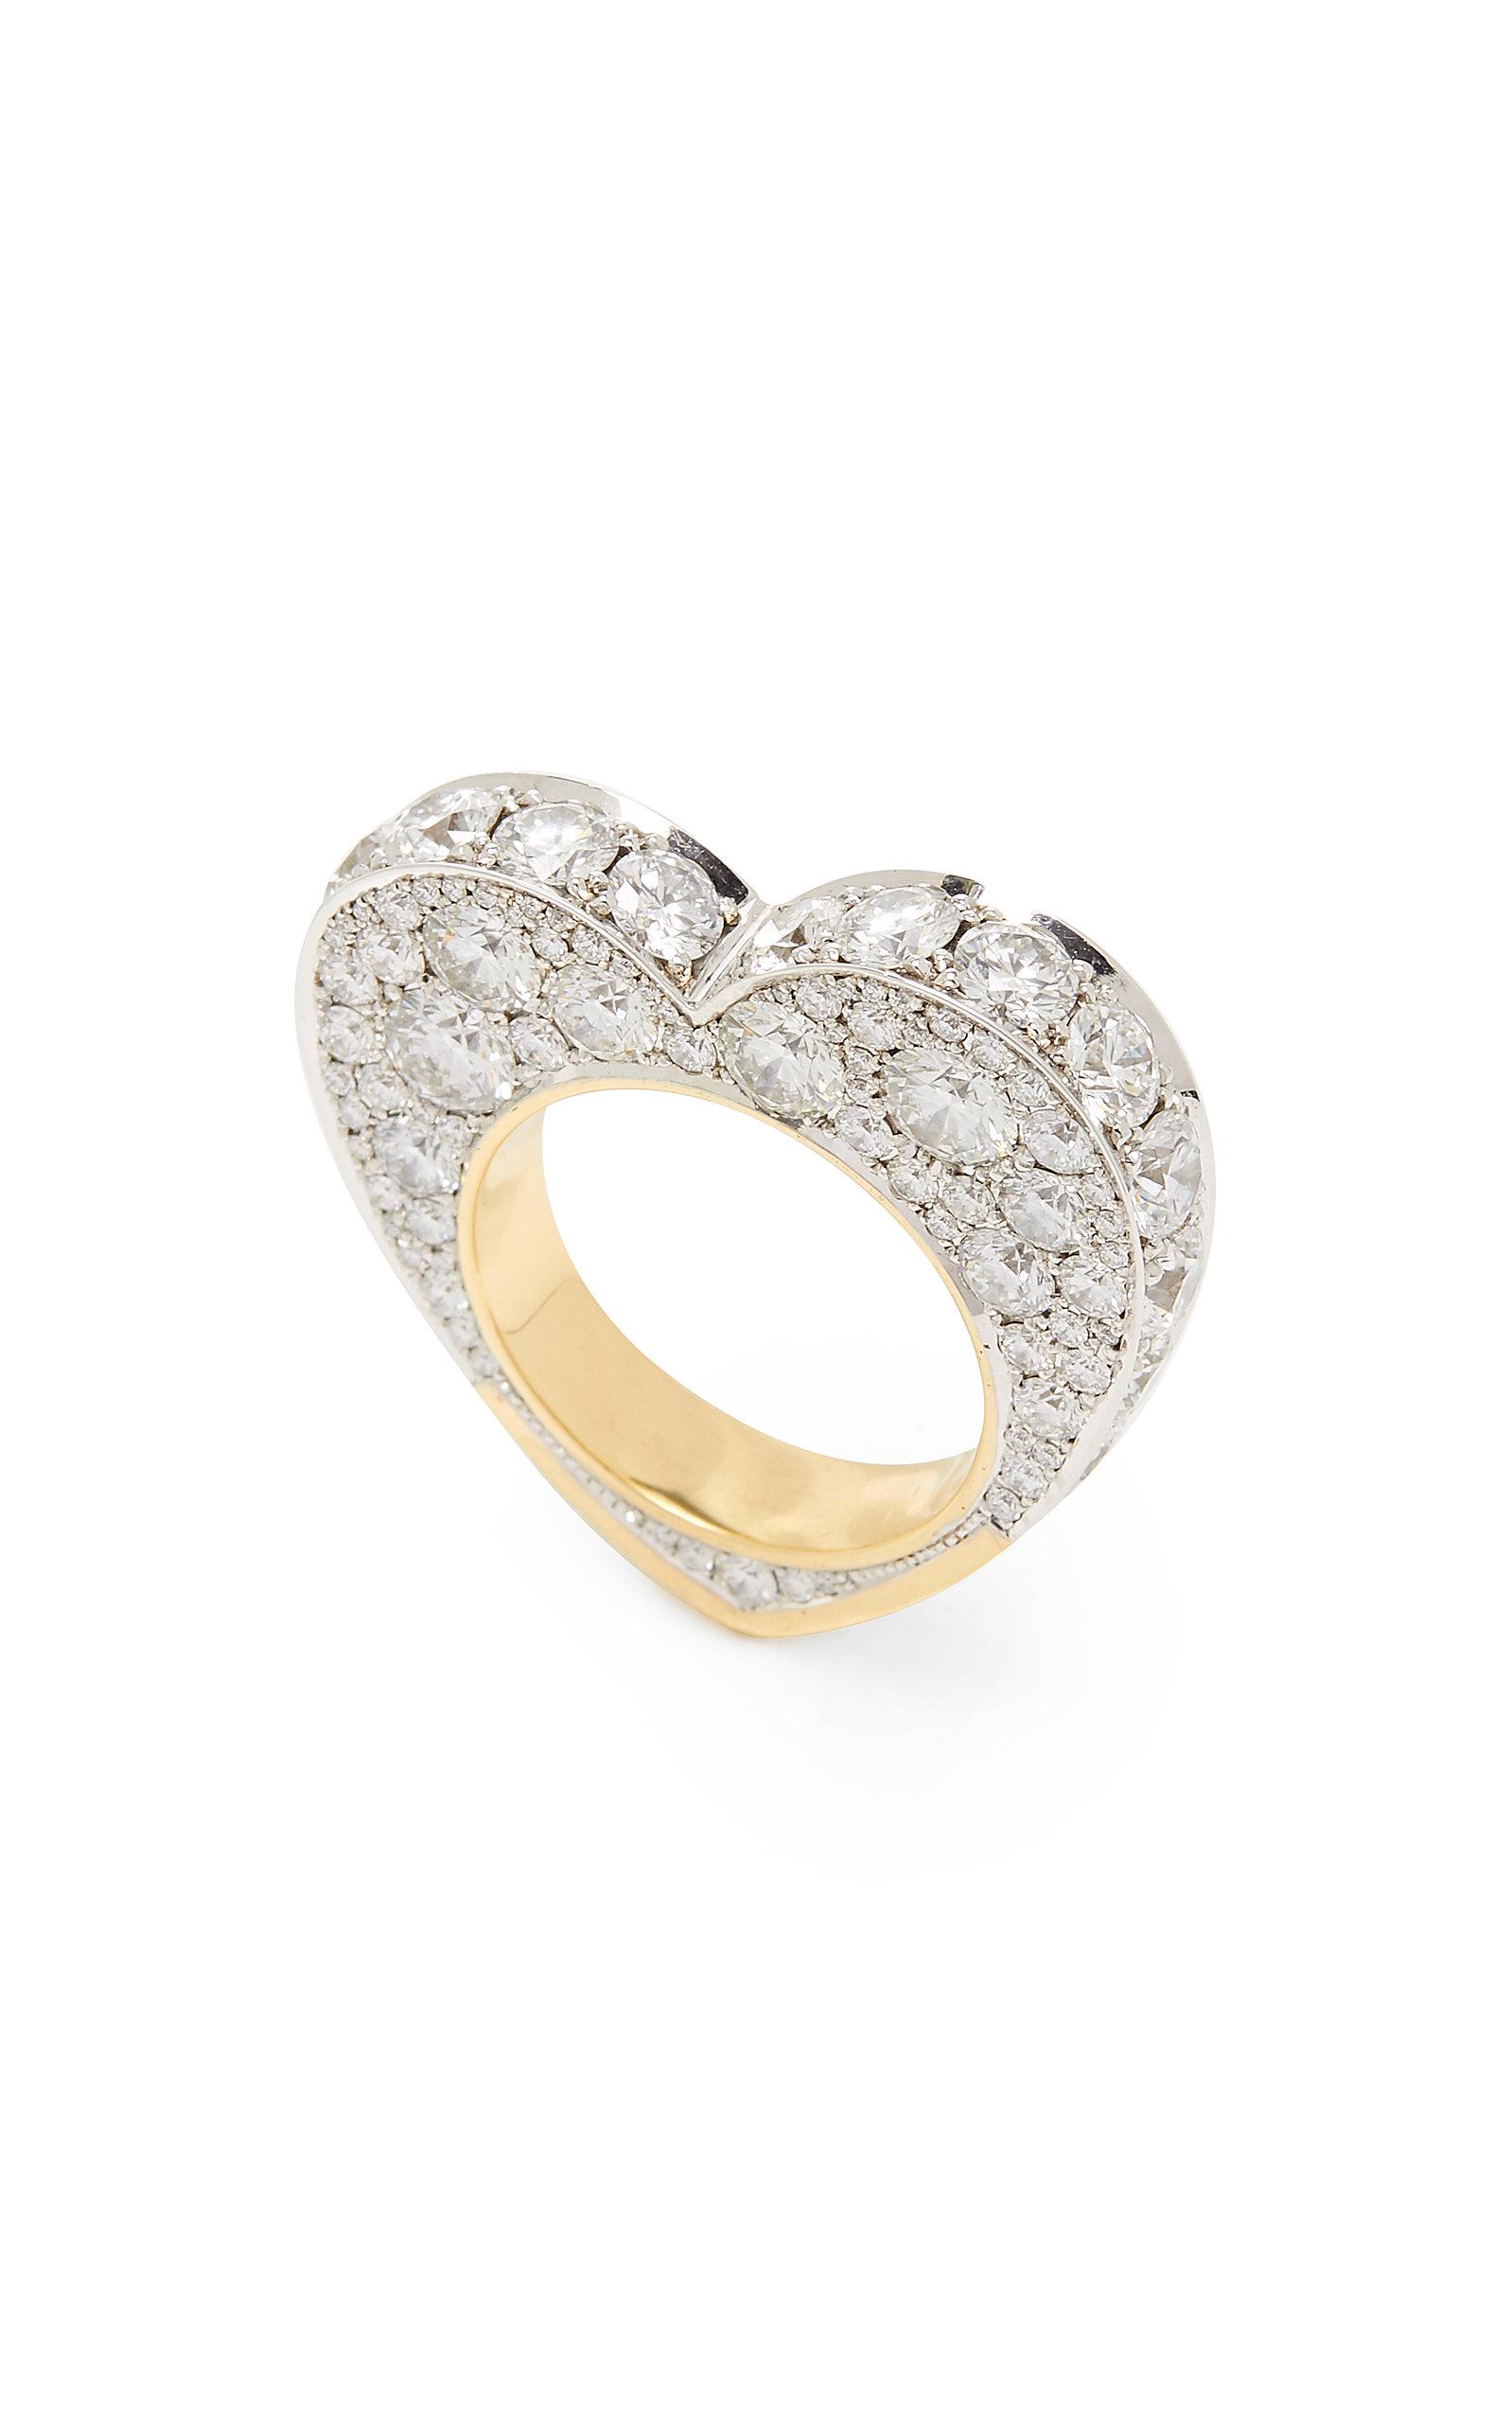 Women's 14K White And Yellow Gold And Diamond Ring